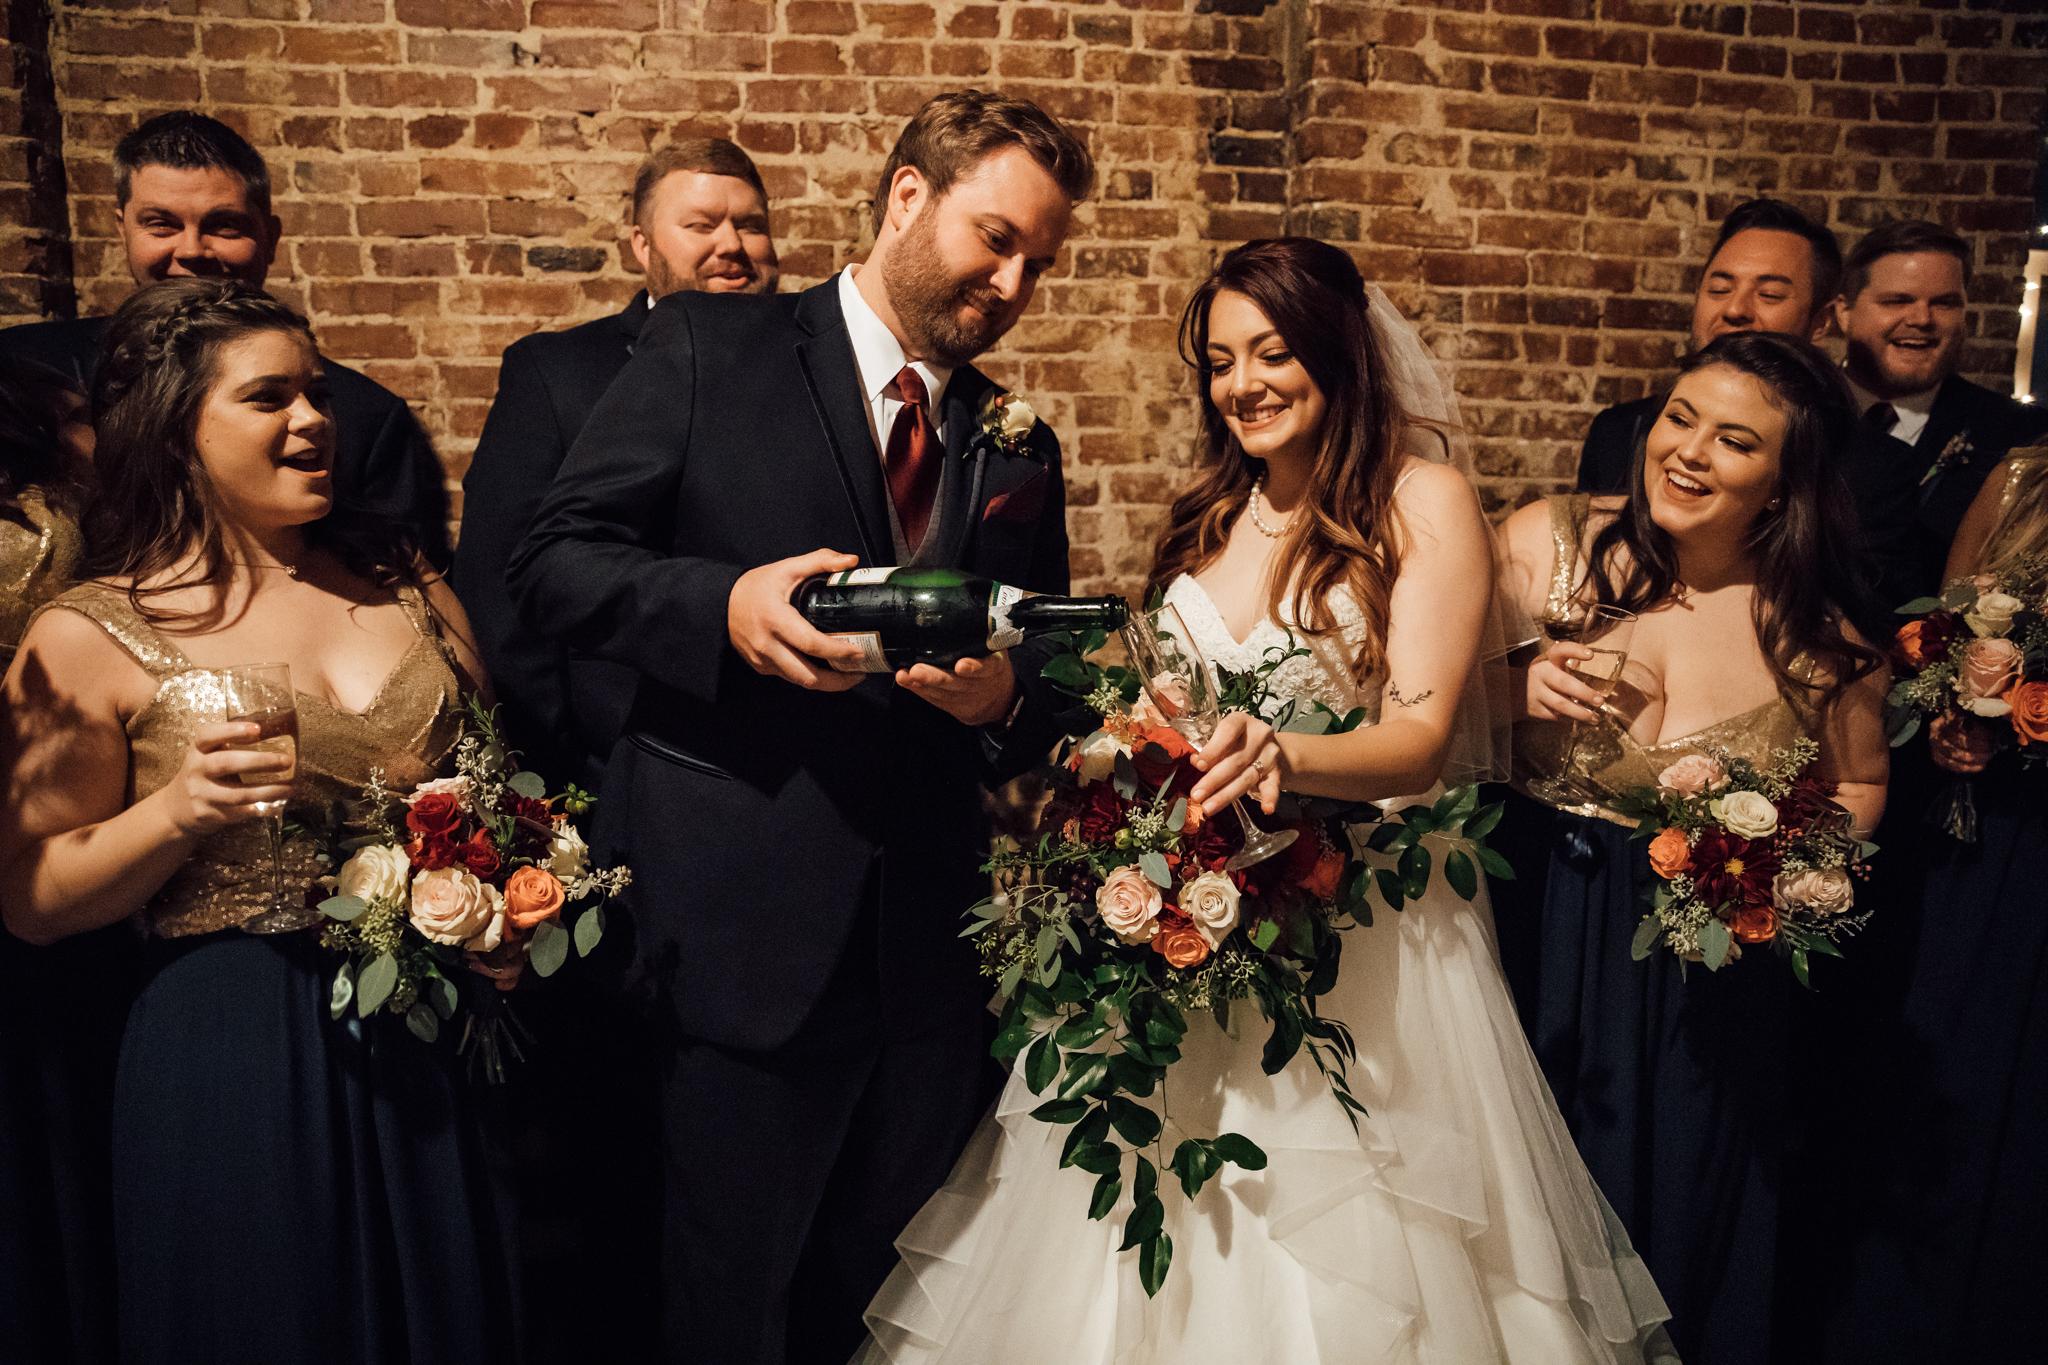 memphis-wedding-photographers-thewarmtharoundyou-ballinese-ballroom (112 of 232).jpg